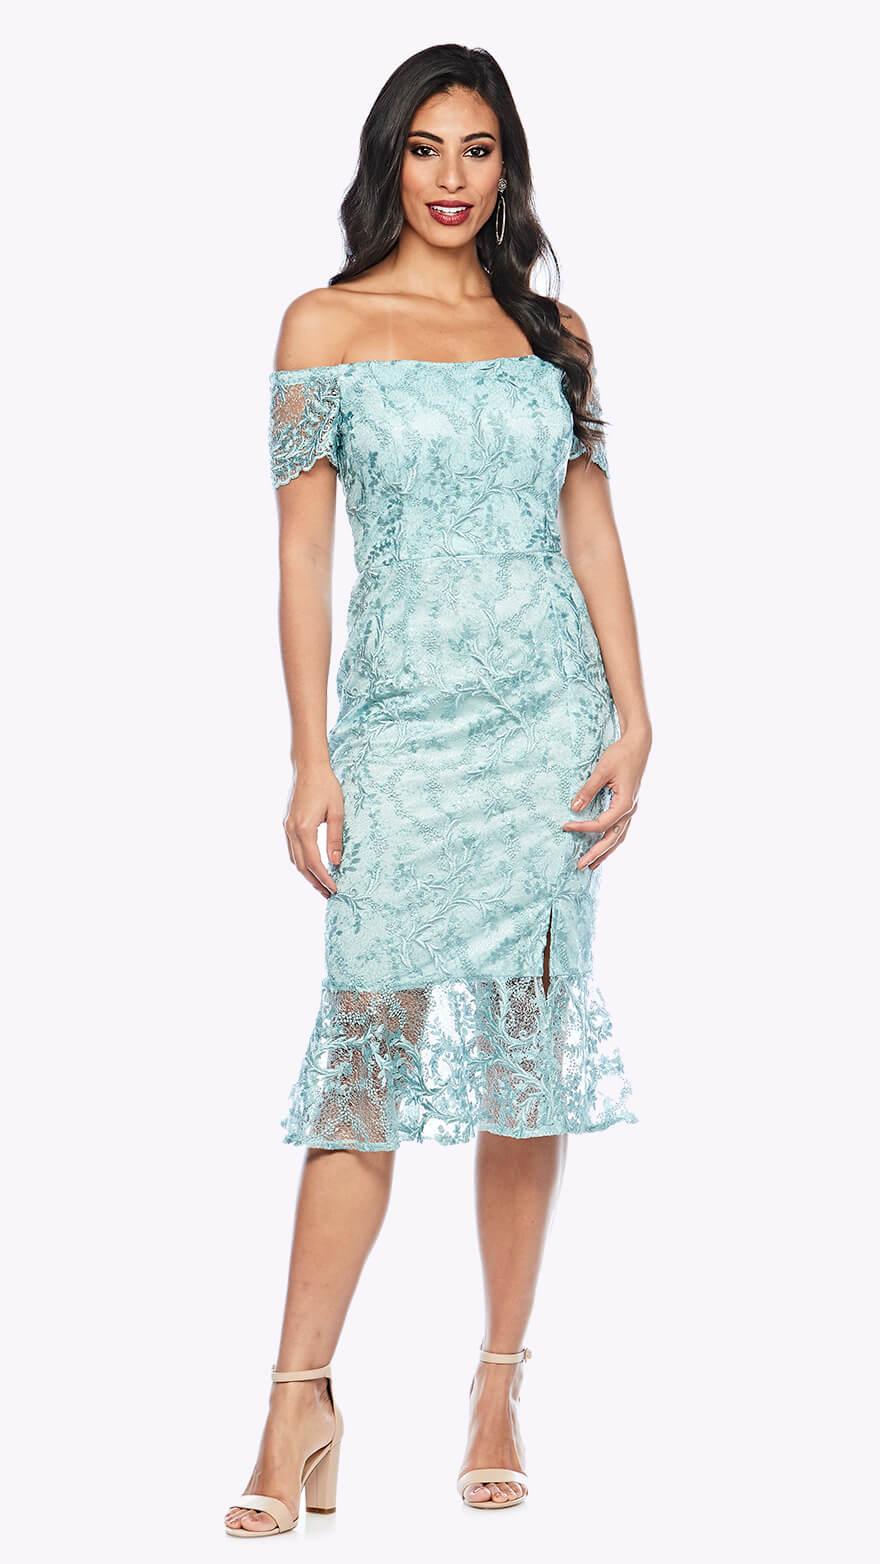 Z0212 Lace off the shoulder cocktail dress with fluted hemline